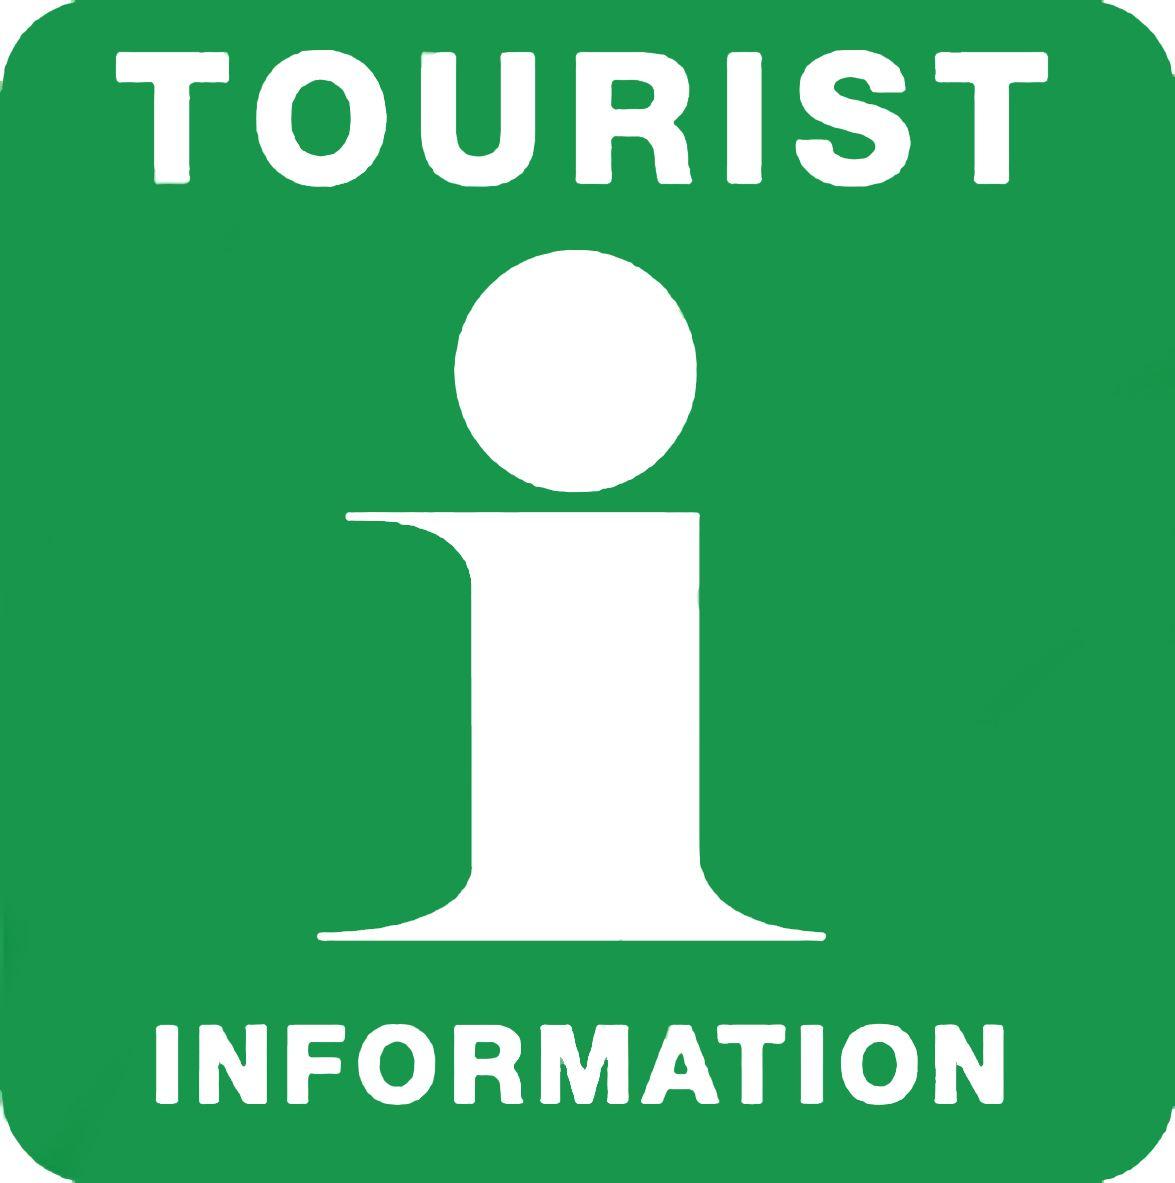 Oskarshamns Touristeninformation